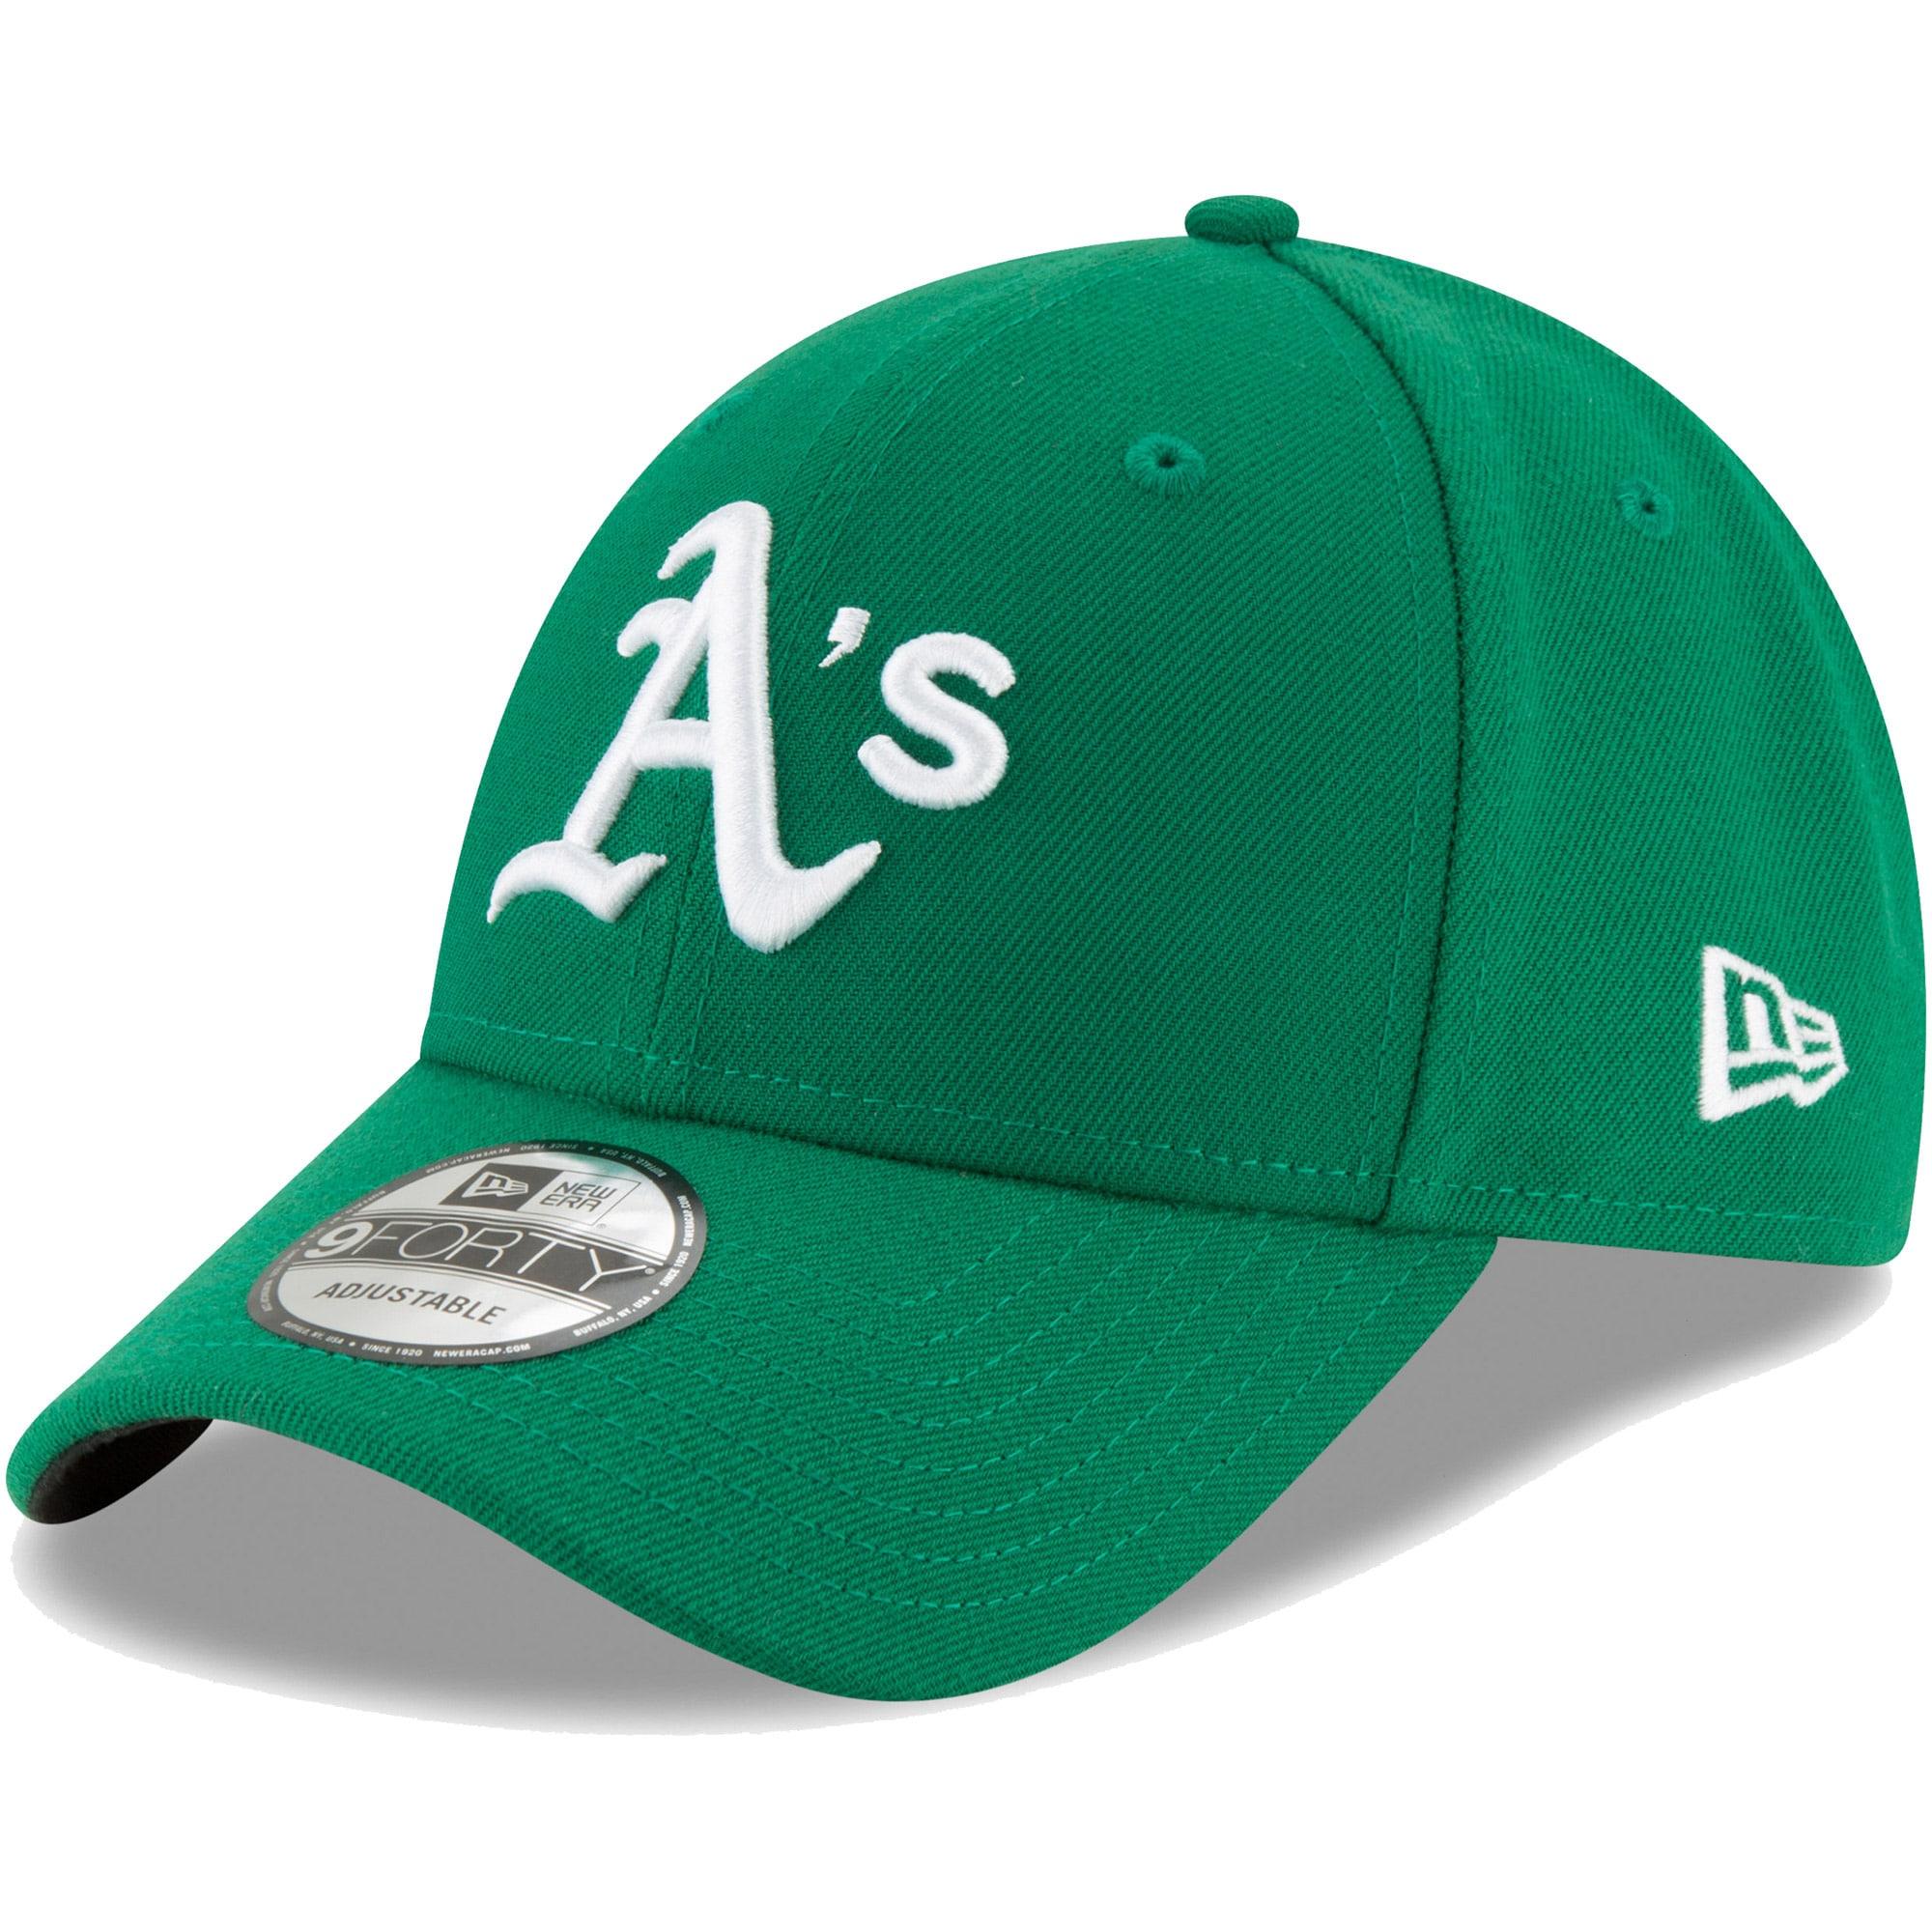 Oakland Athletics New Era Alternate The League 9FORTY Adjustable Hat - Green